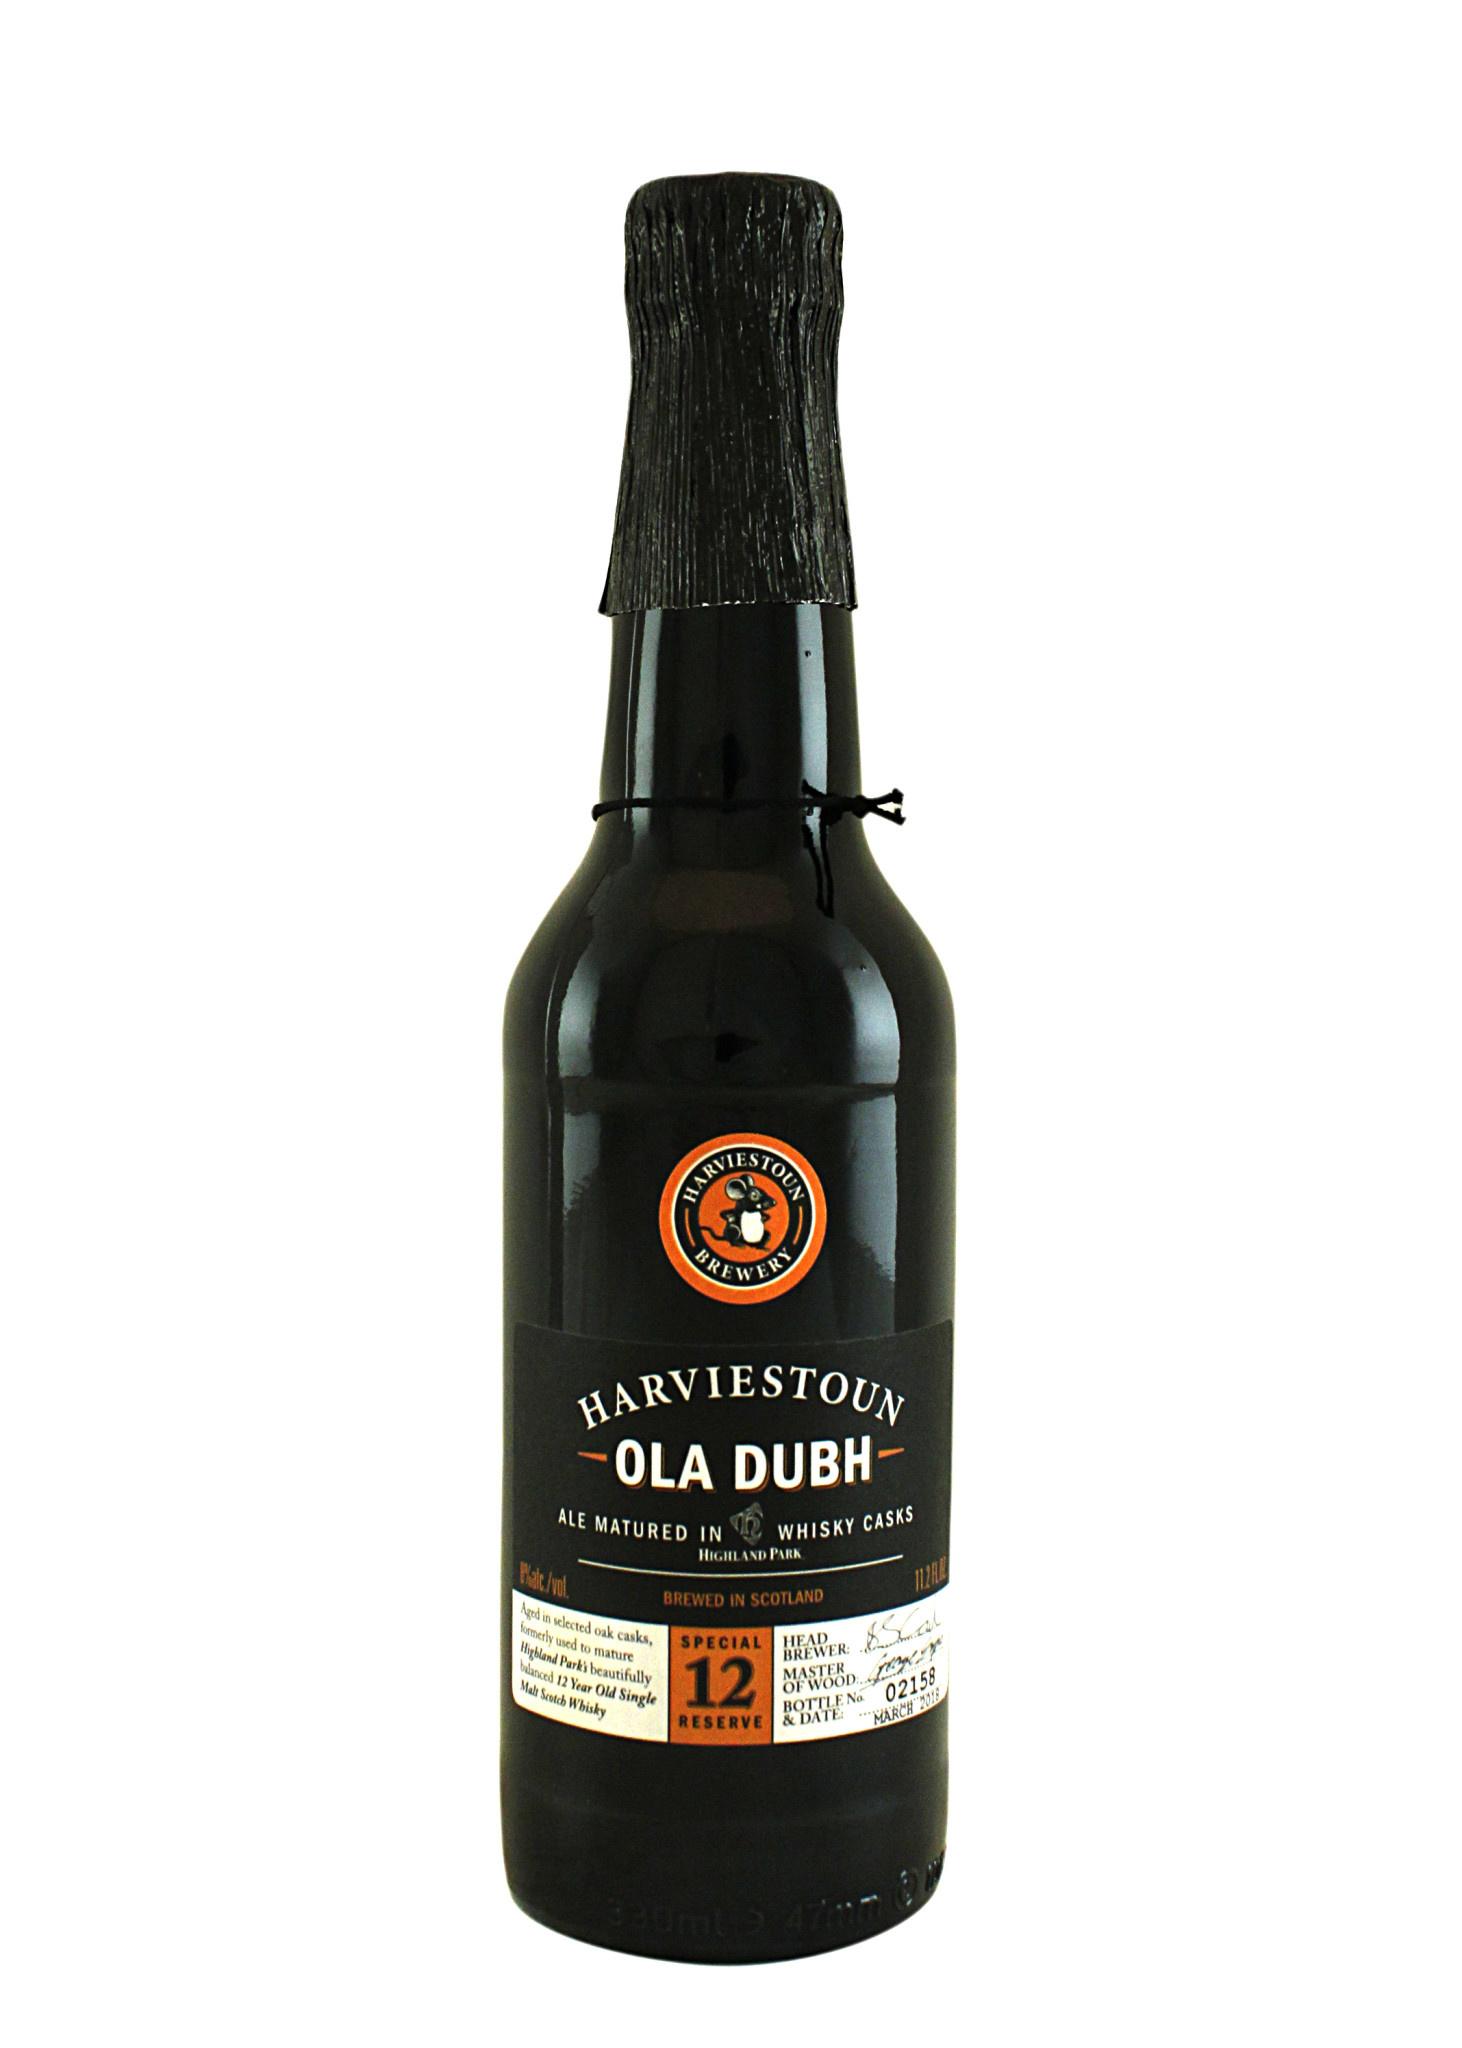 Harviestoun Ola Dubh Ale 12 Year Barrel-Aged , Scotland